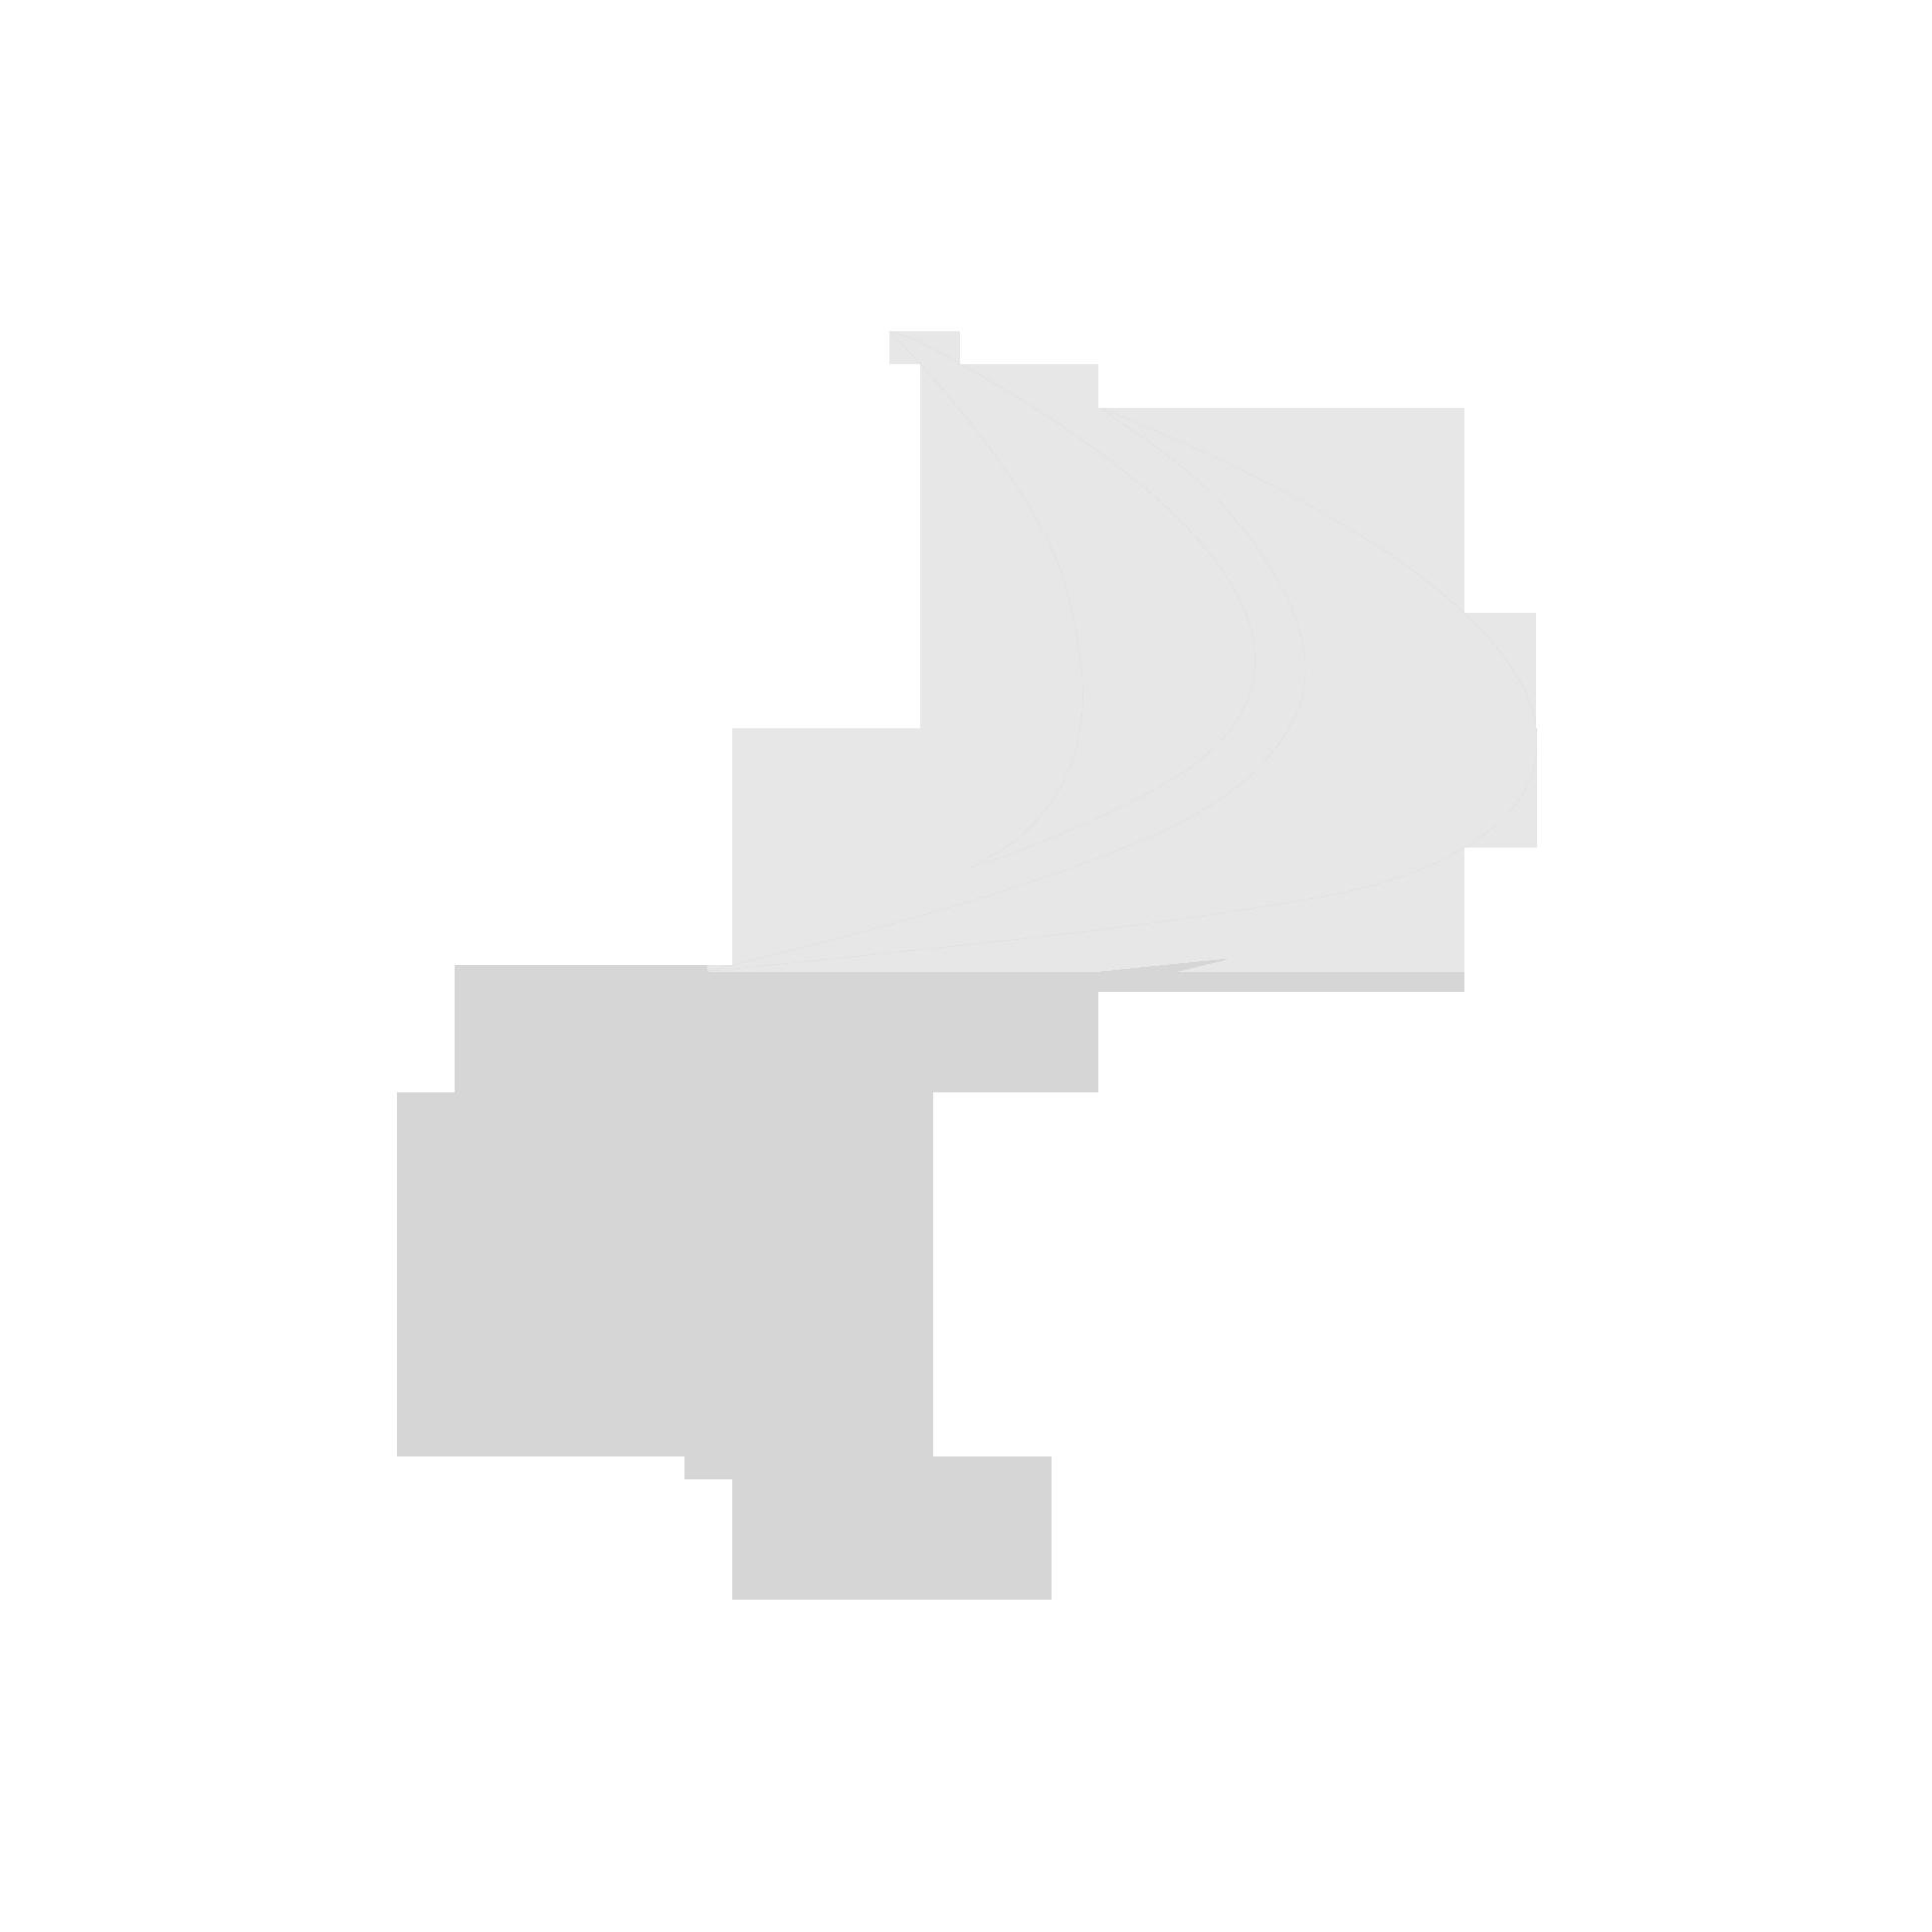 Jung Pumpen Steuerung BasicLogo AD 46 ExM, TLS mit Staudruckniveaugeber